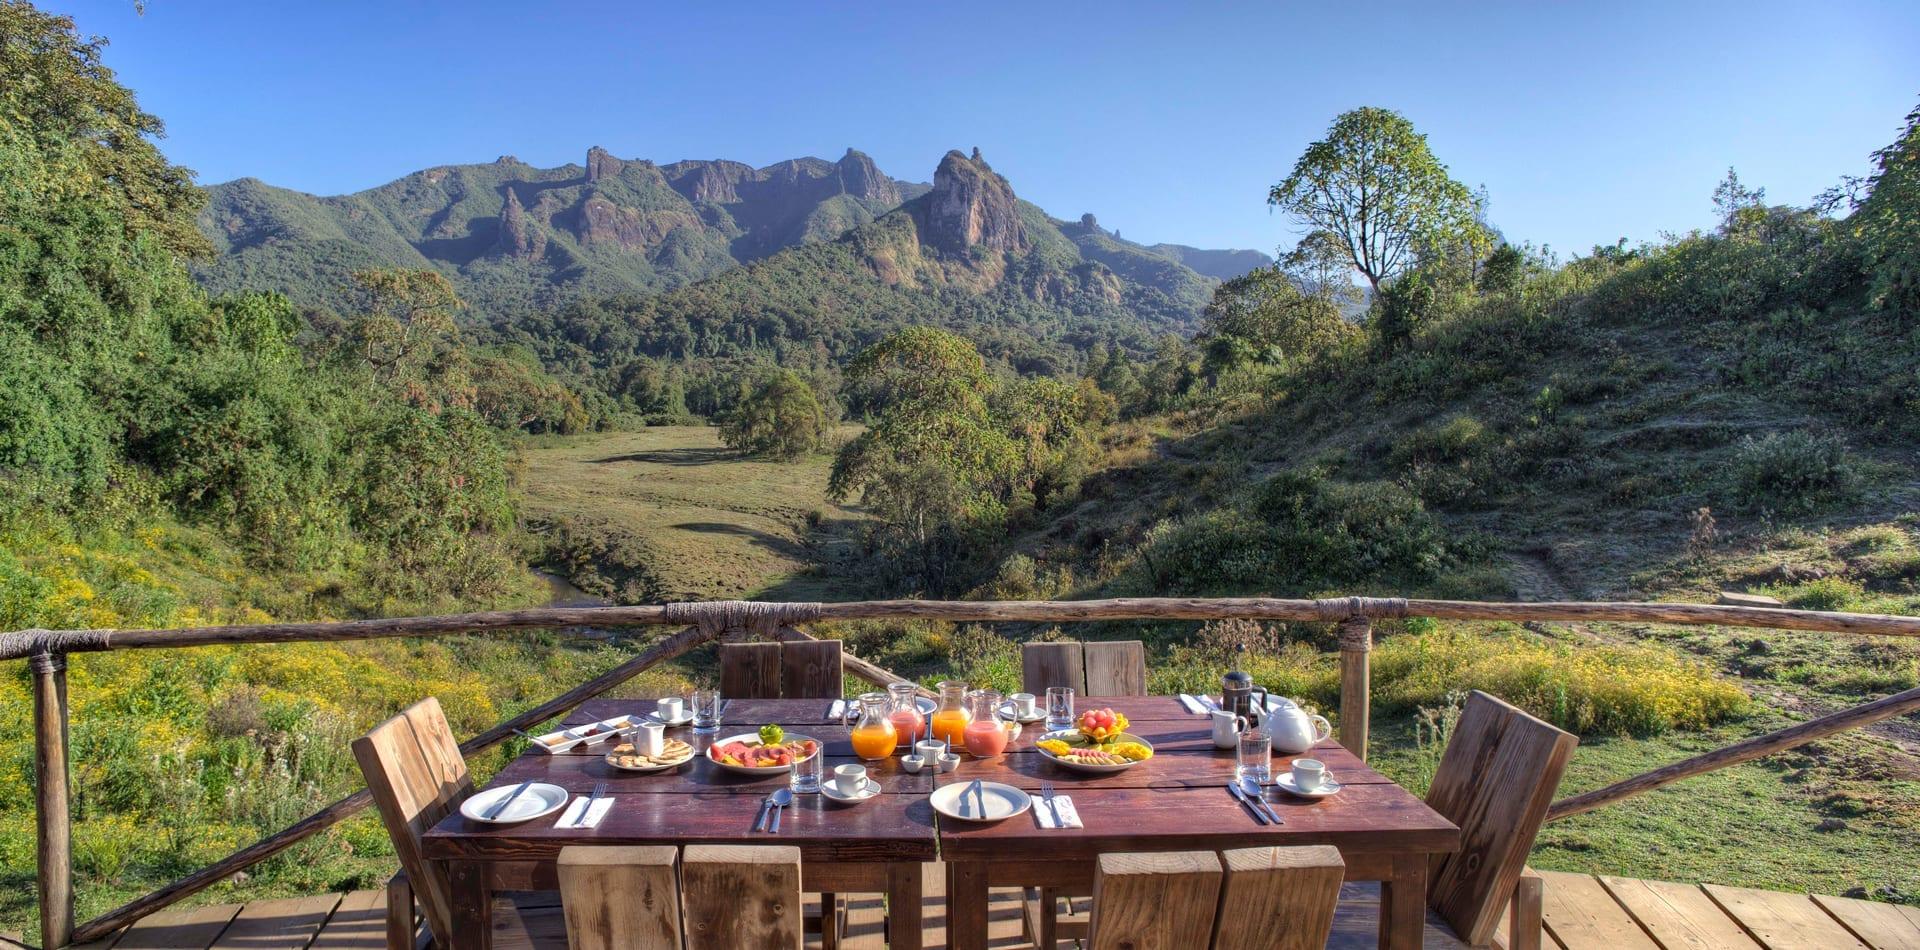 HERO Ethiopia Bale Mountain Lodge Breakfast View